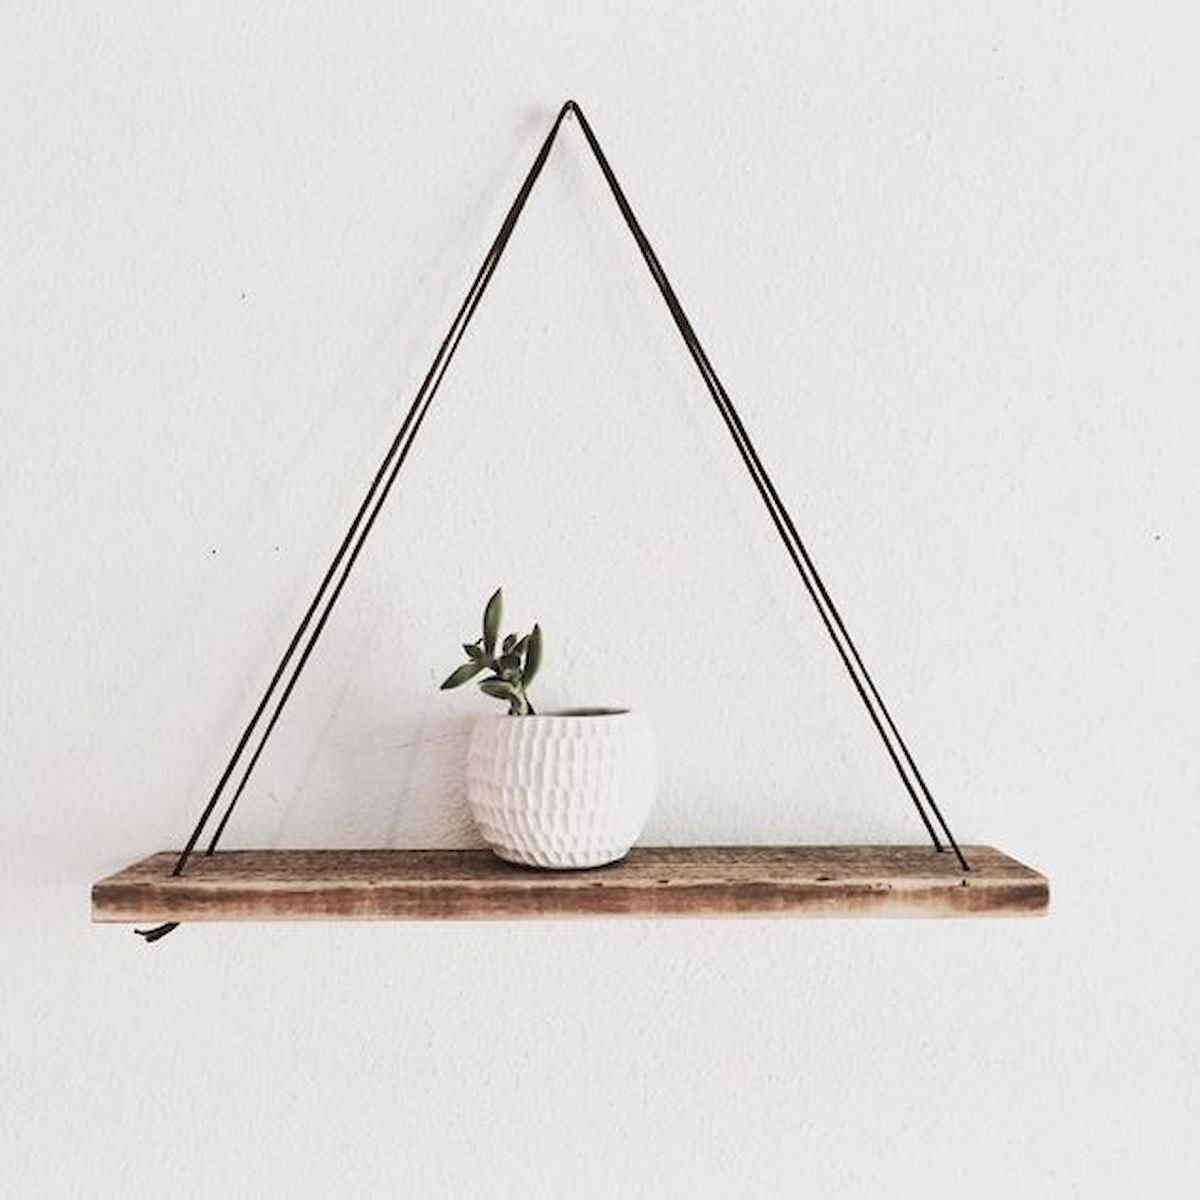 50 Fantastic DIY Home Decor Ideas On A Budget (30)